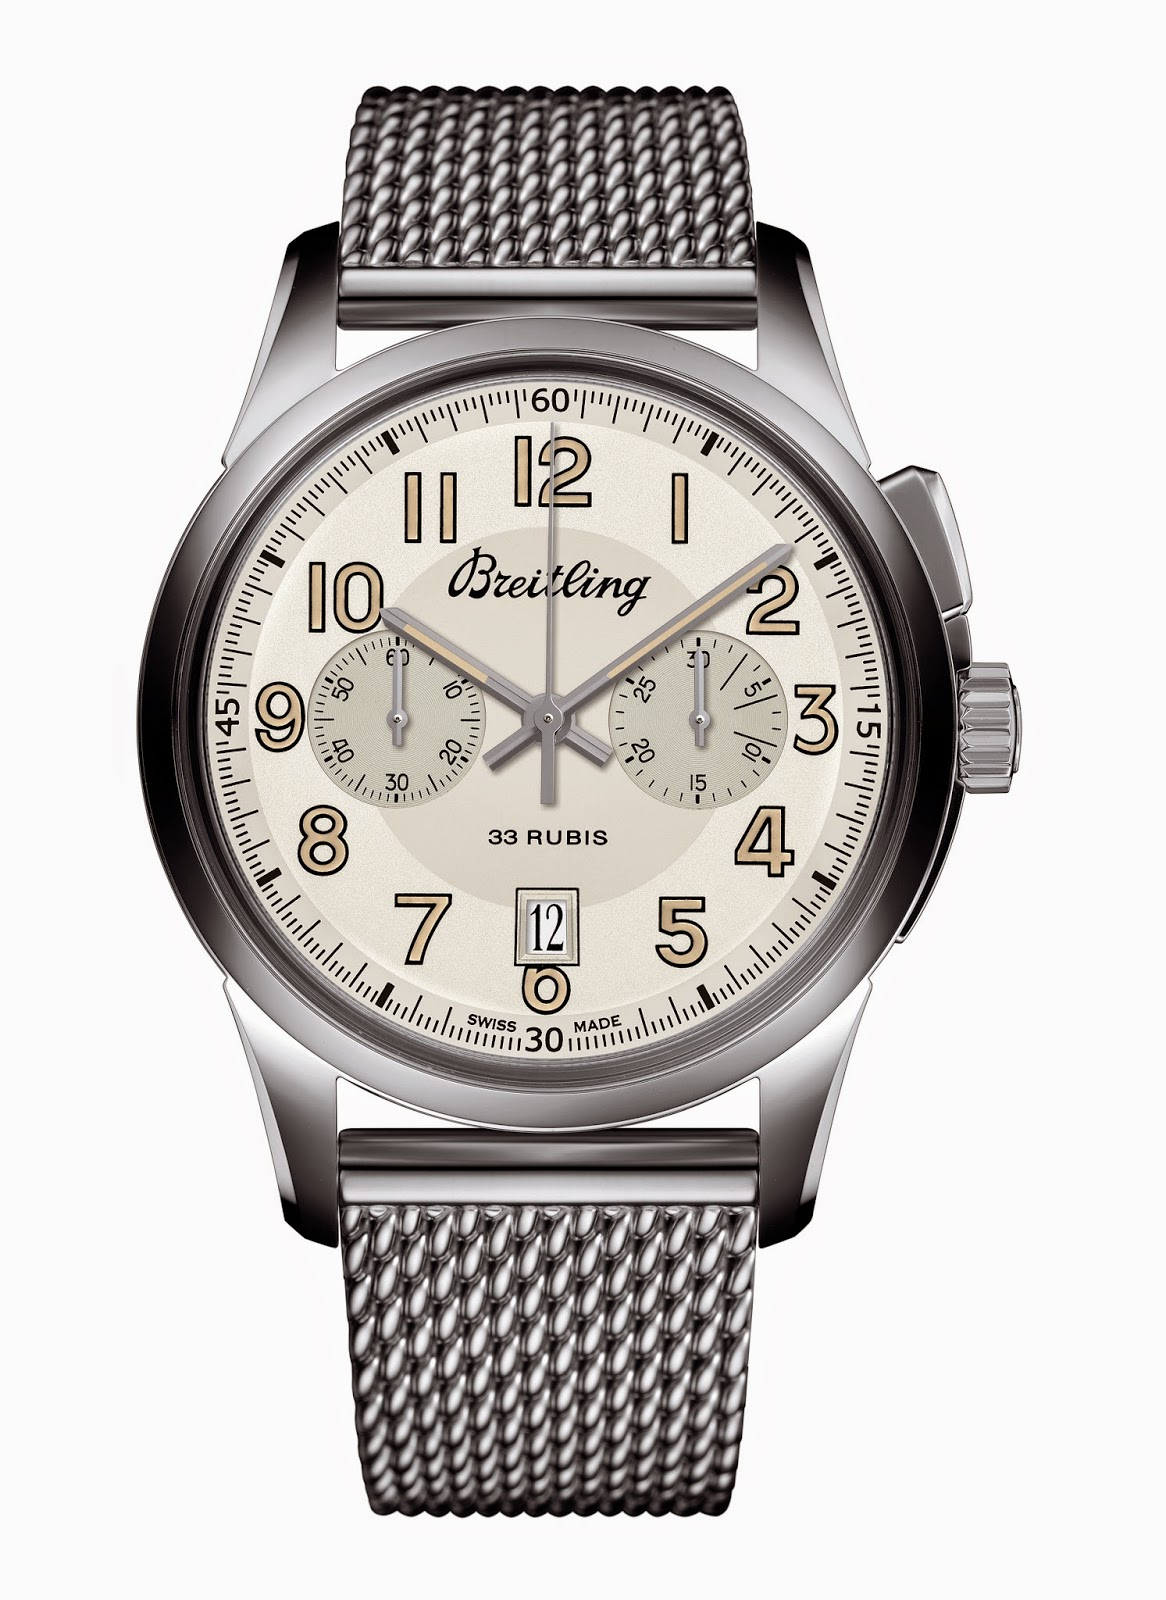 Breitling Transocean Chronograph 19151